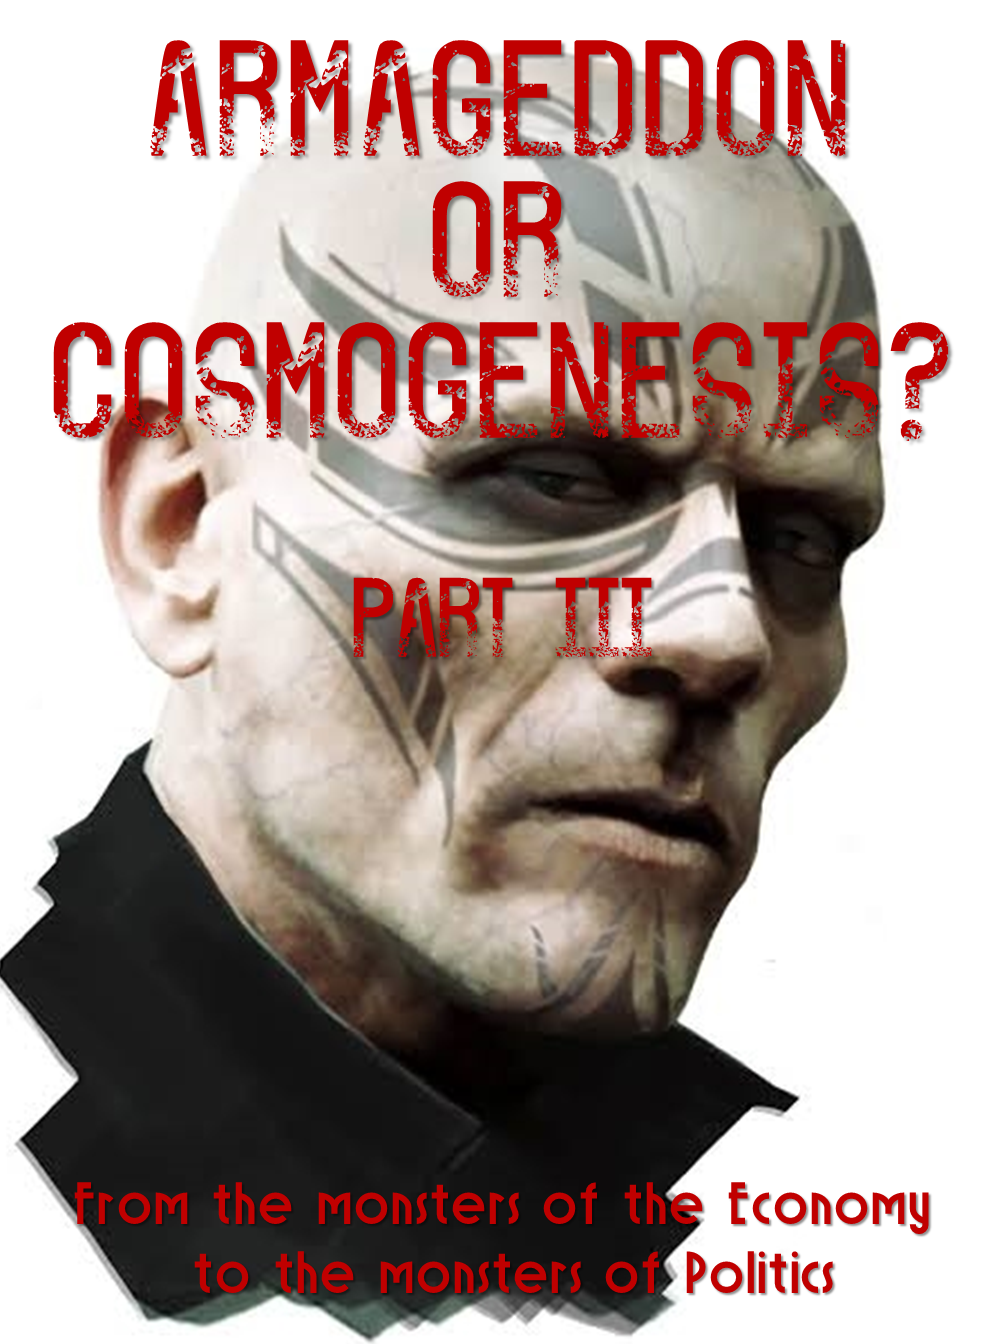 Armageddon or Cosmogenesis (3)